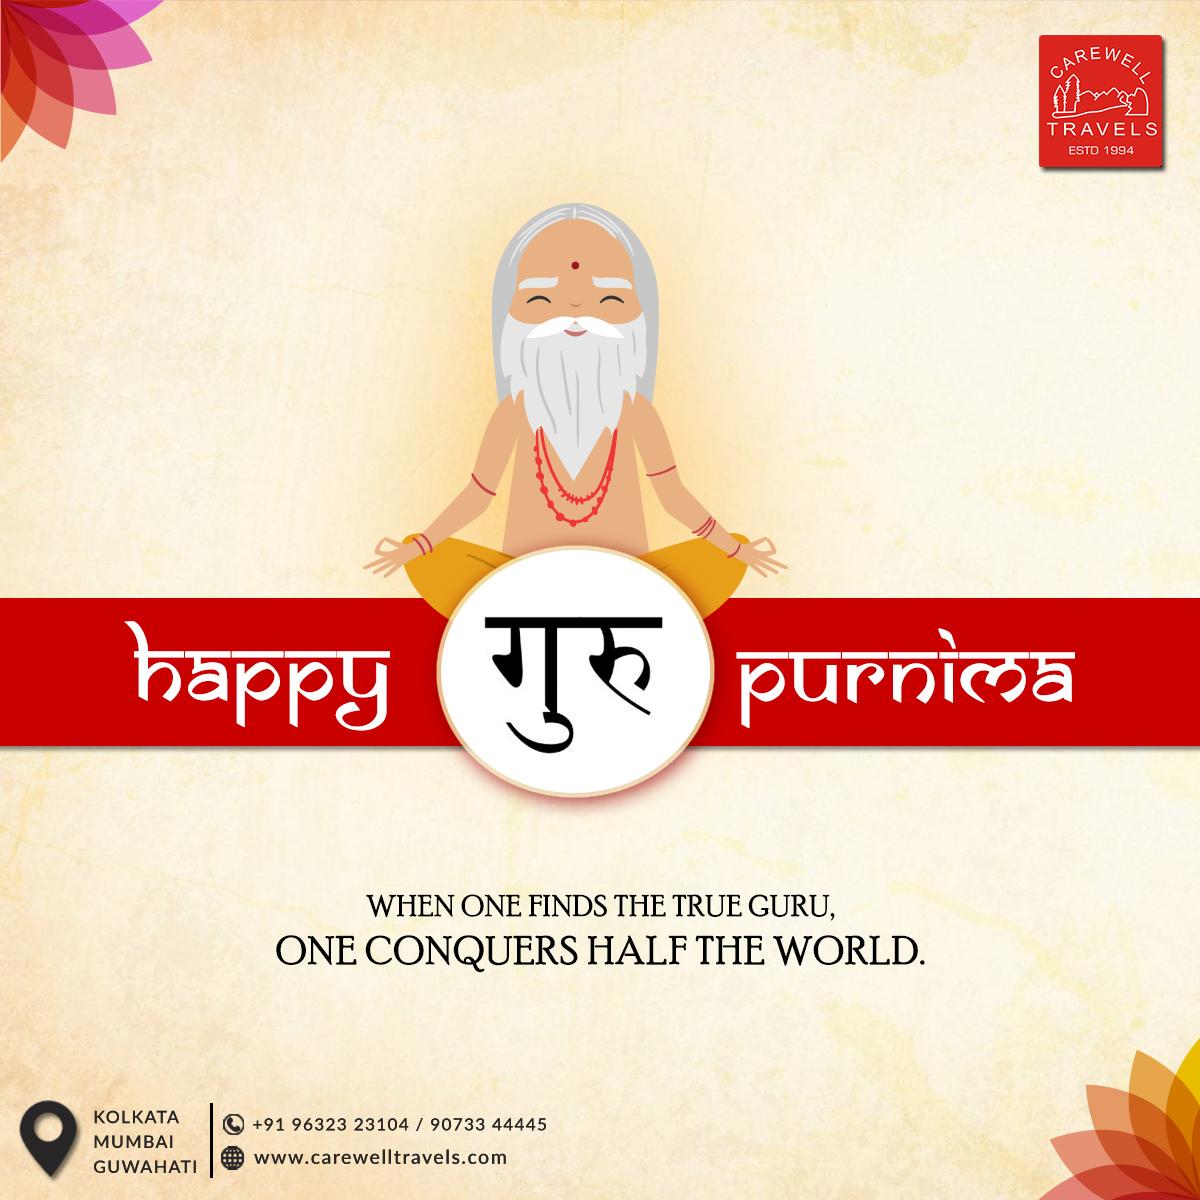 Happy Guru Purnima.  #GuruPurnima #CarewellTravels #TravelAgency #Kolkata #Mumbai #Guwahati #CareBeyondComparepic.twitter.com/jIw2lcd9ah